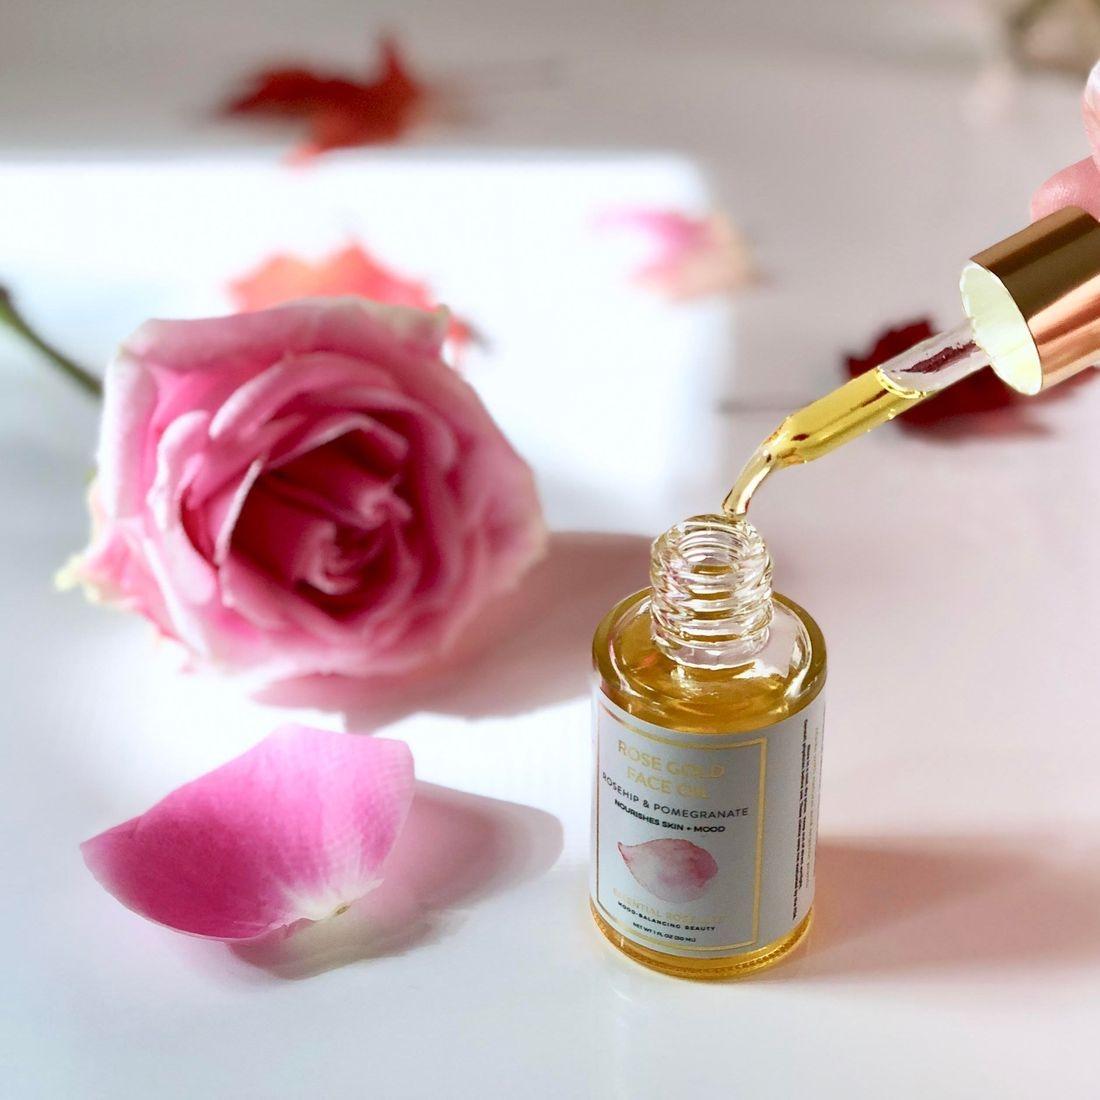 RosePost Box, Essential Rose Life, RosePost Subscription Box, Rose Beauty Box, Rose-infused beauty